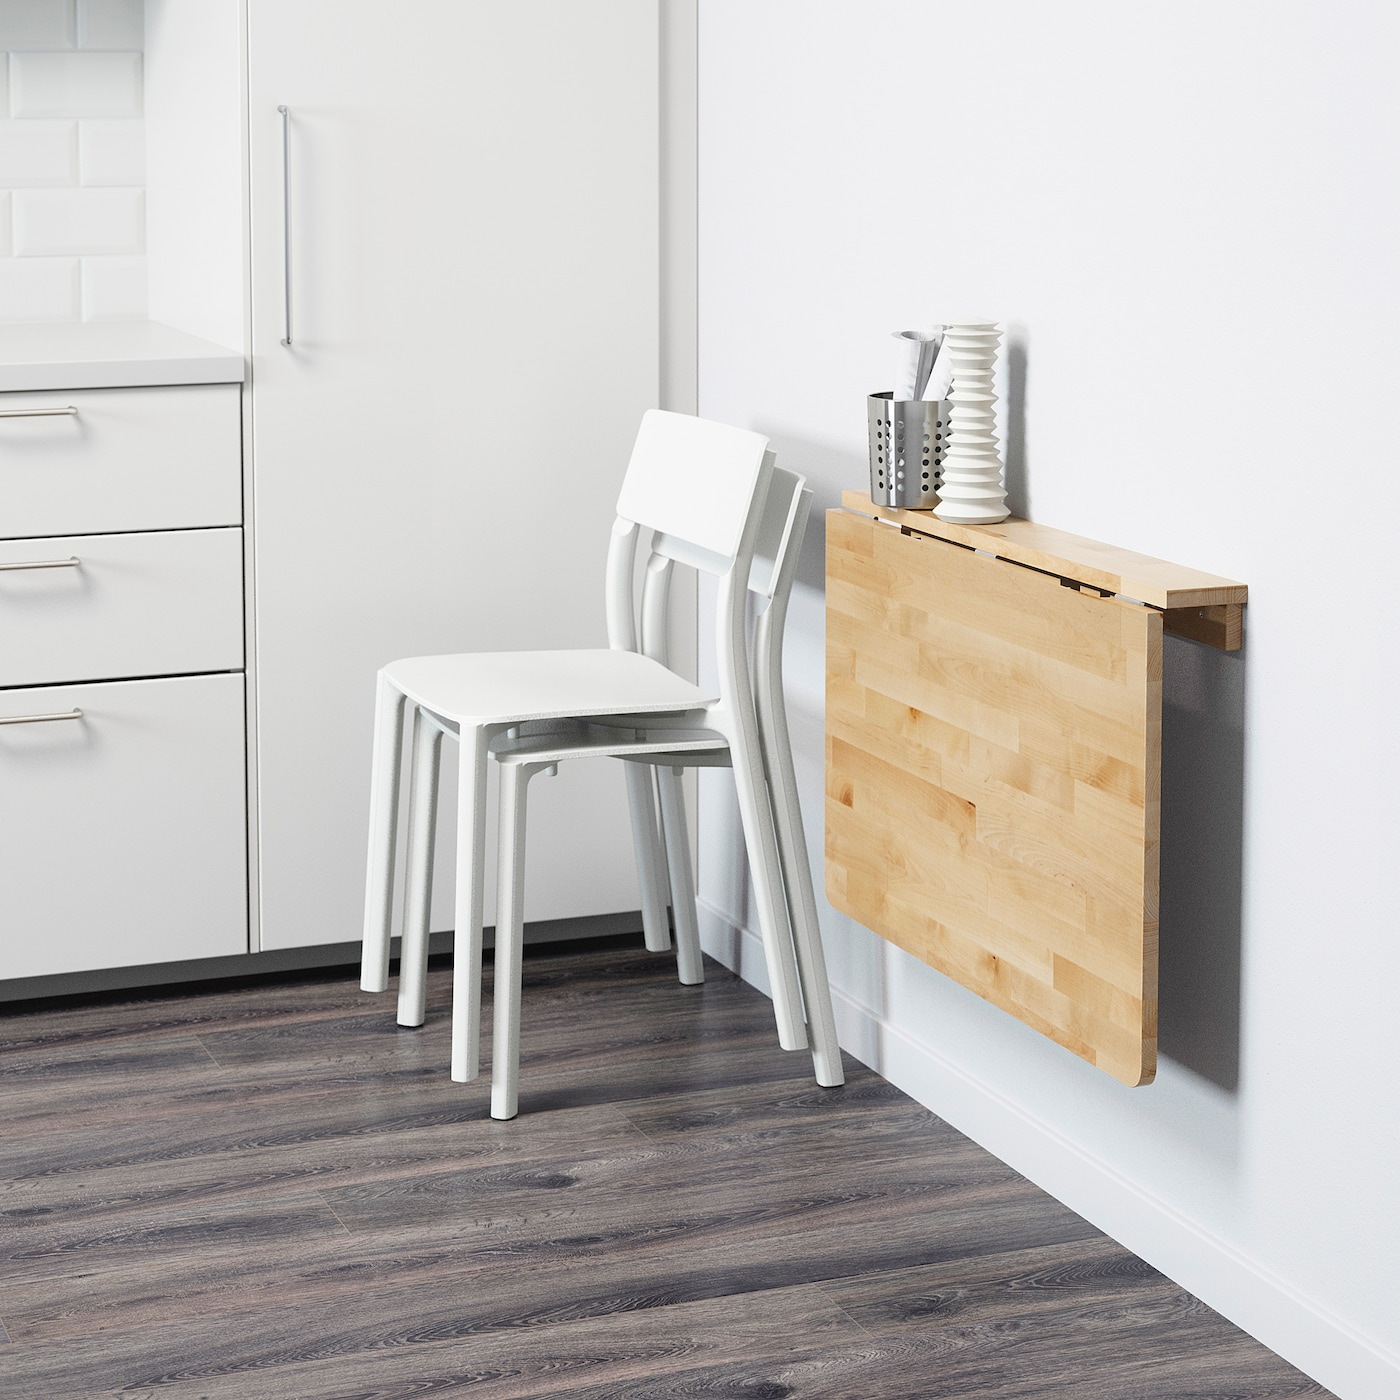 Norbo Wandklapptisch Birke Ikea Deutschland